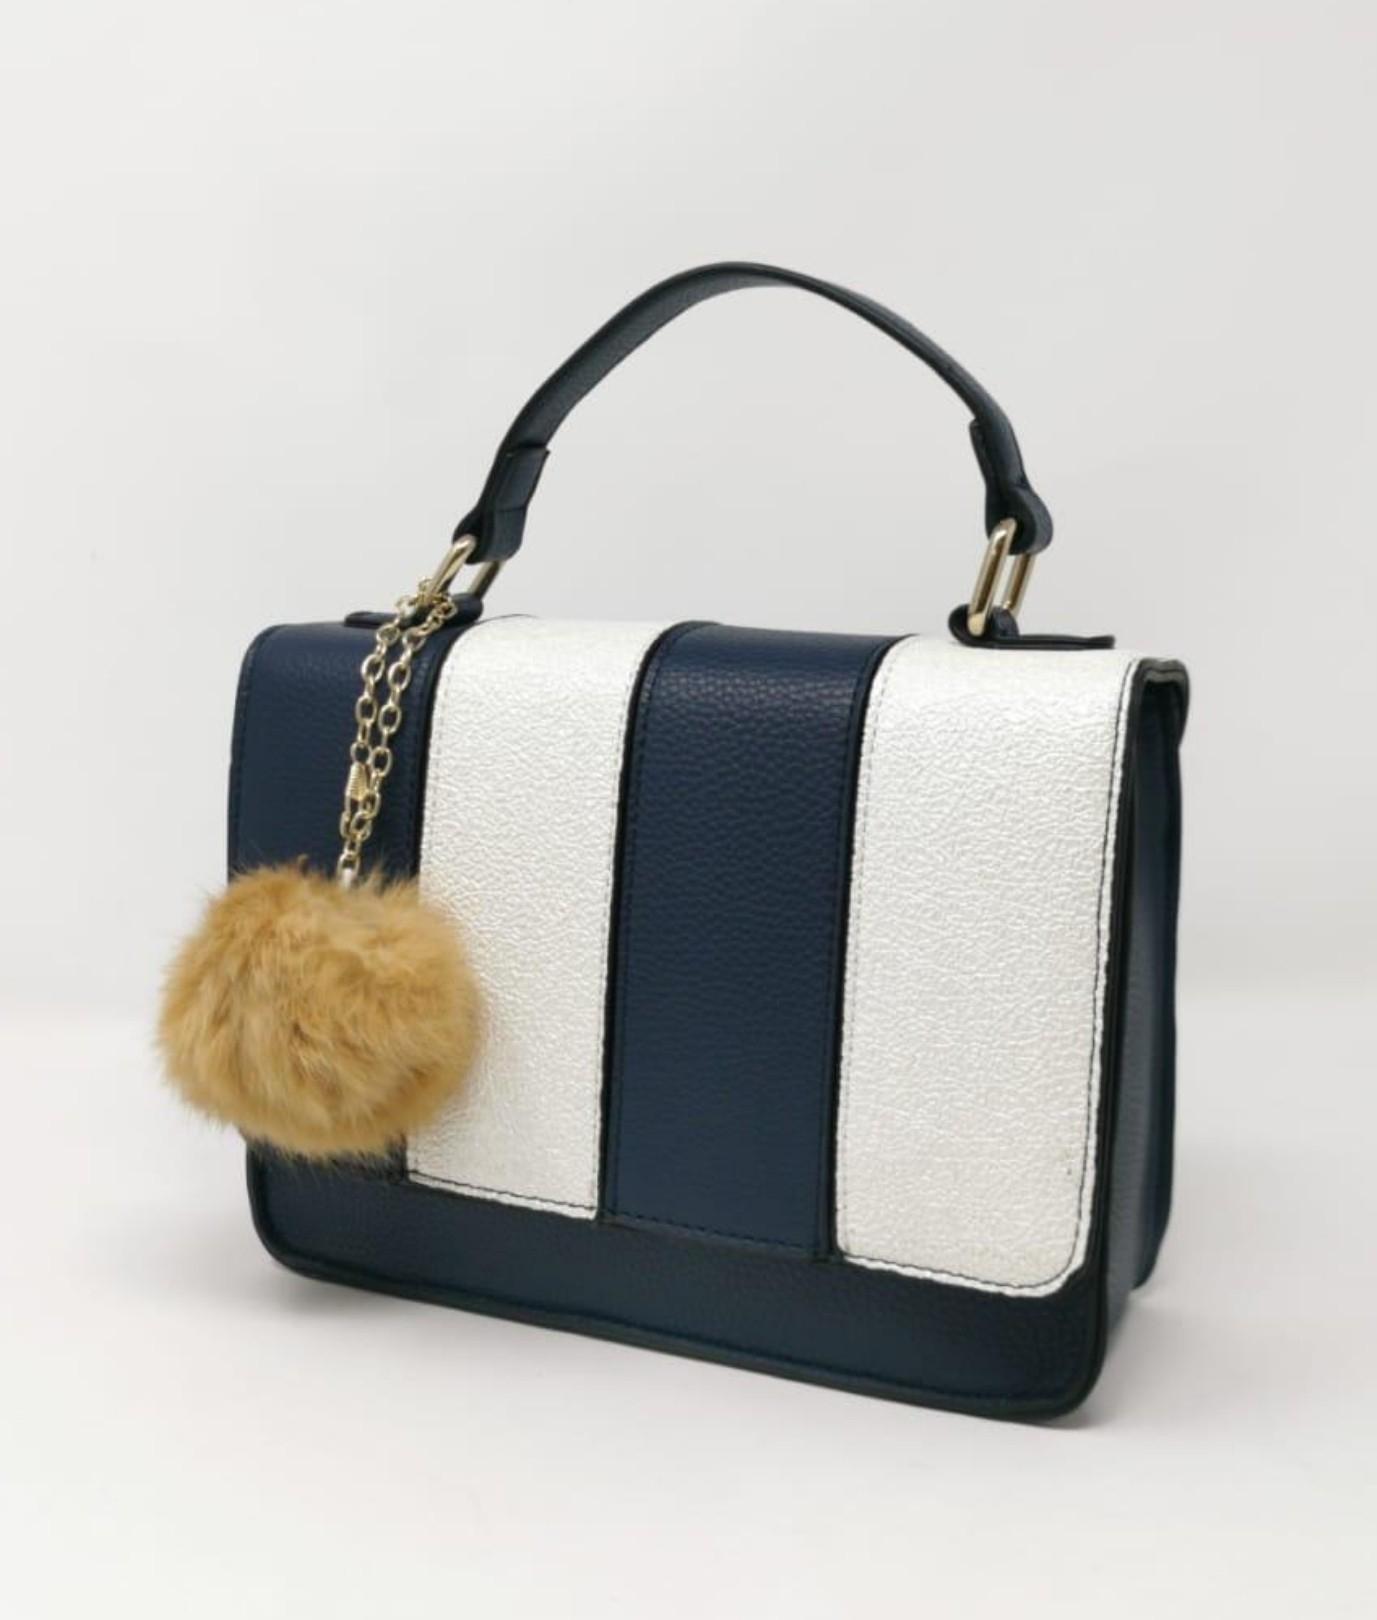 ARDY BAG - NAVY BLUE